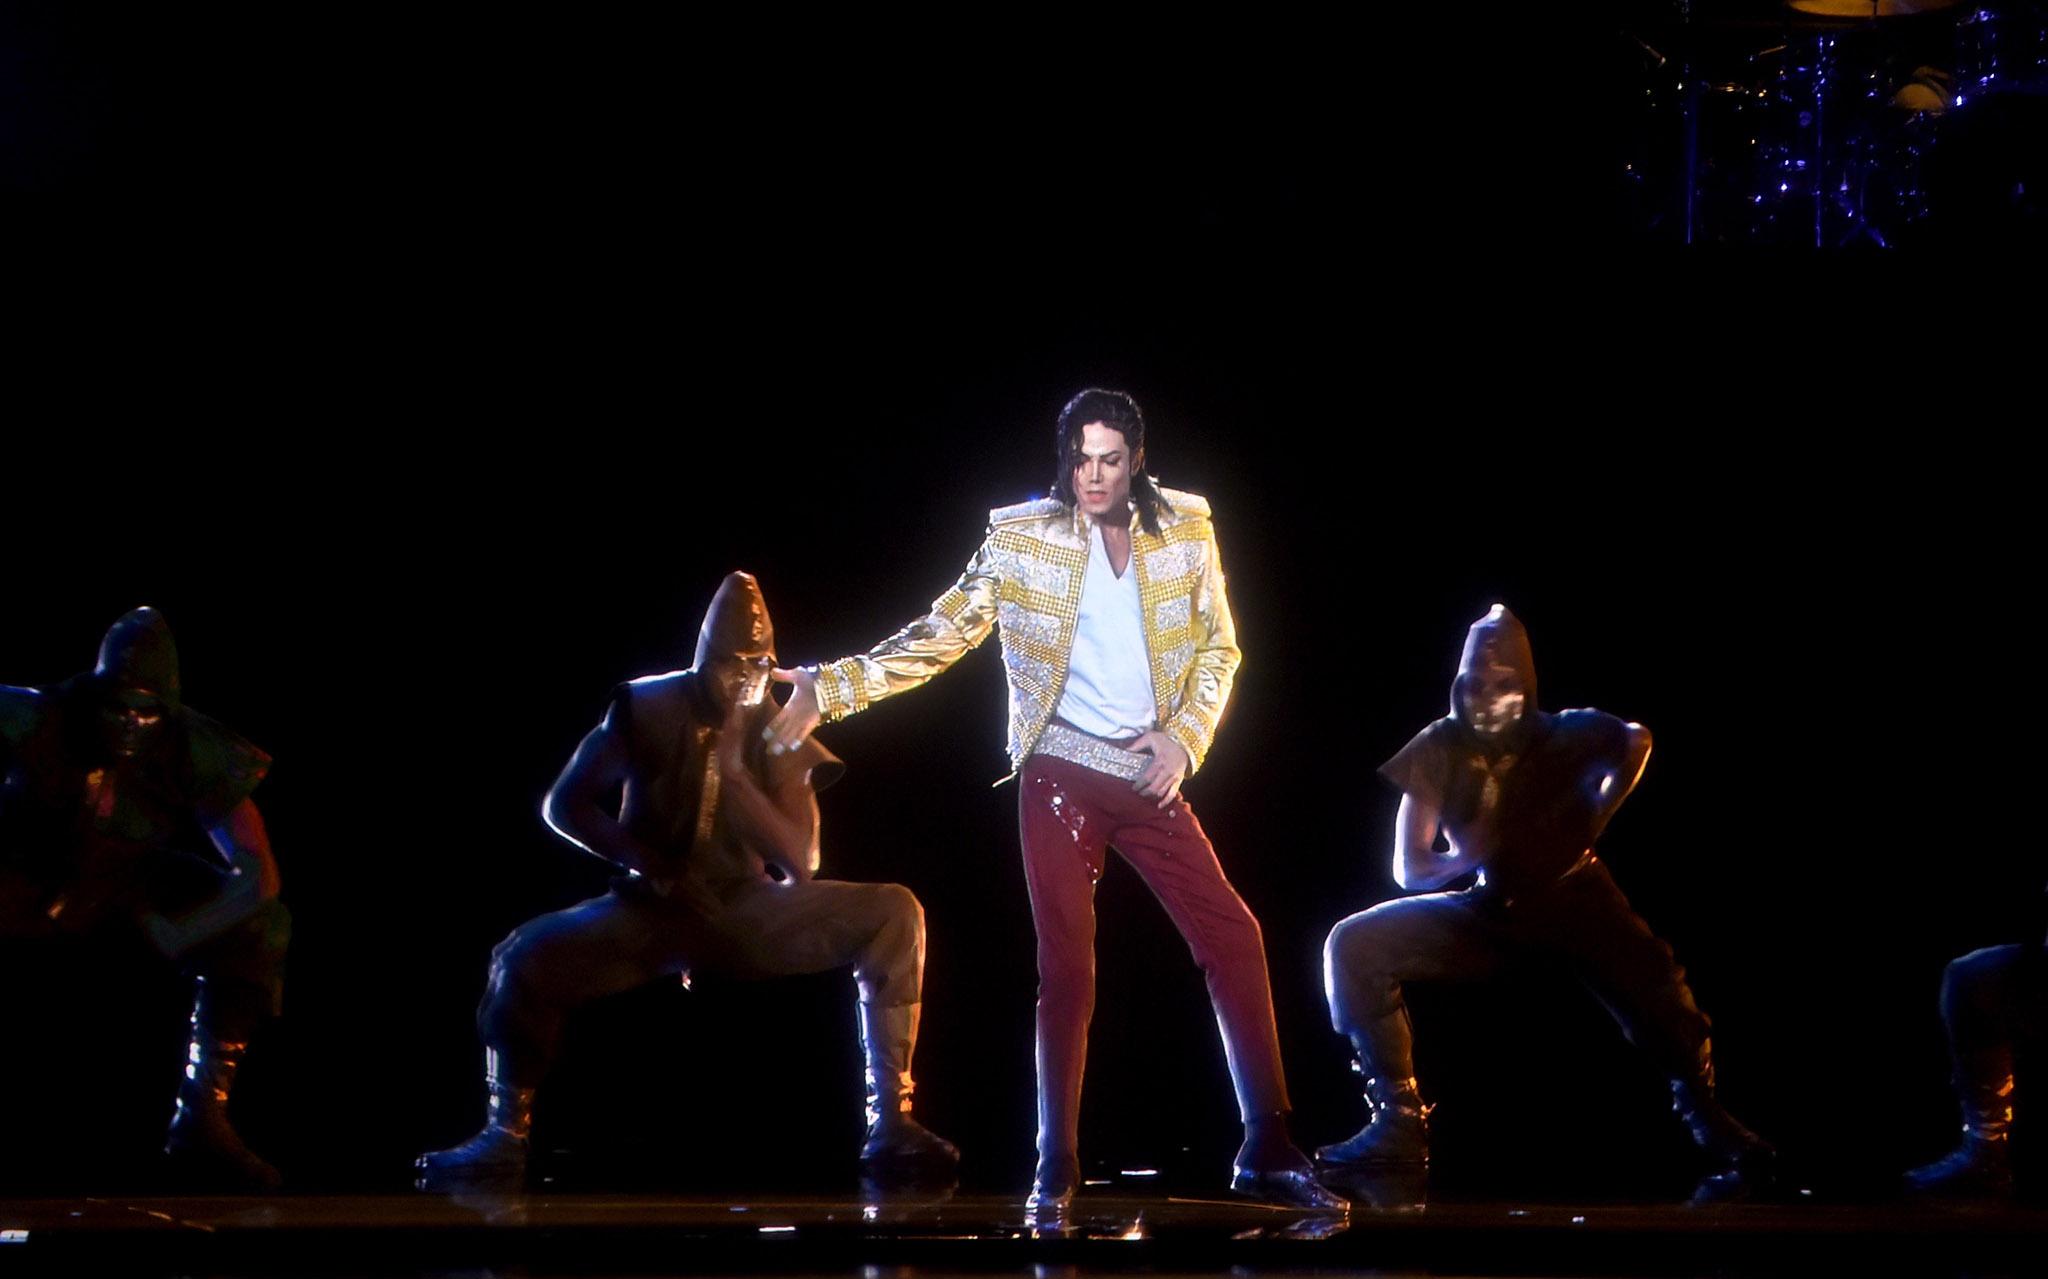 Michael Jackson Hologram Performance At The 2014 Billboard muziek Awards